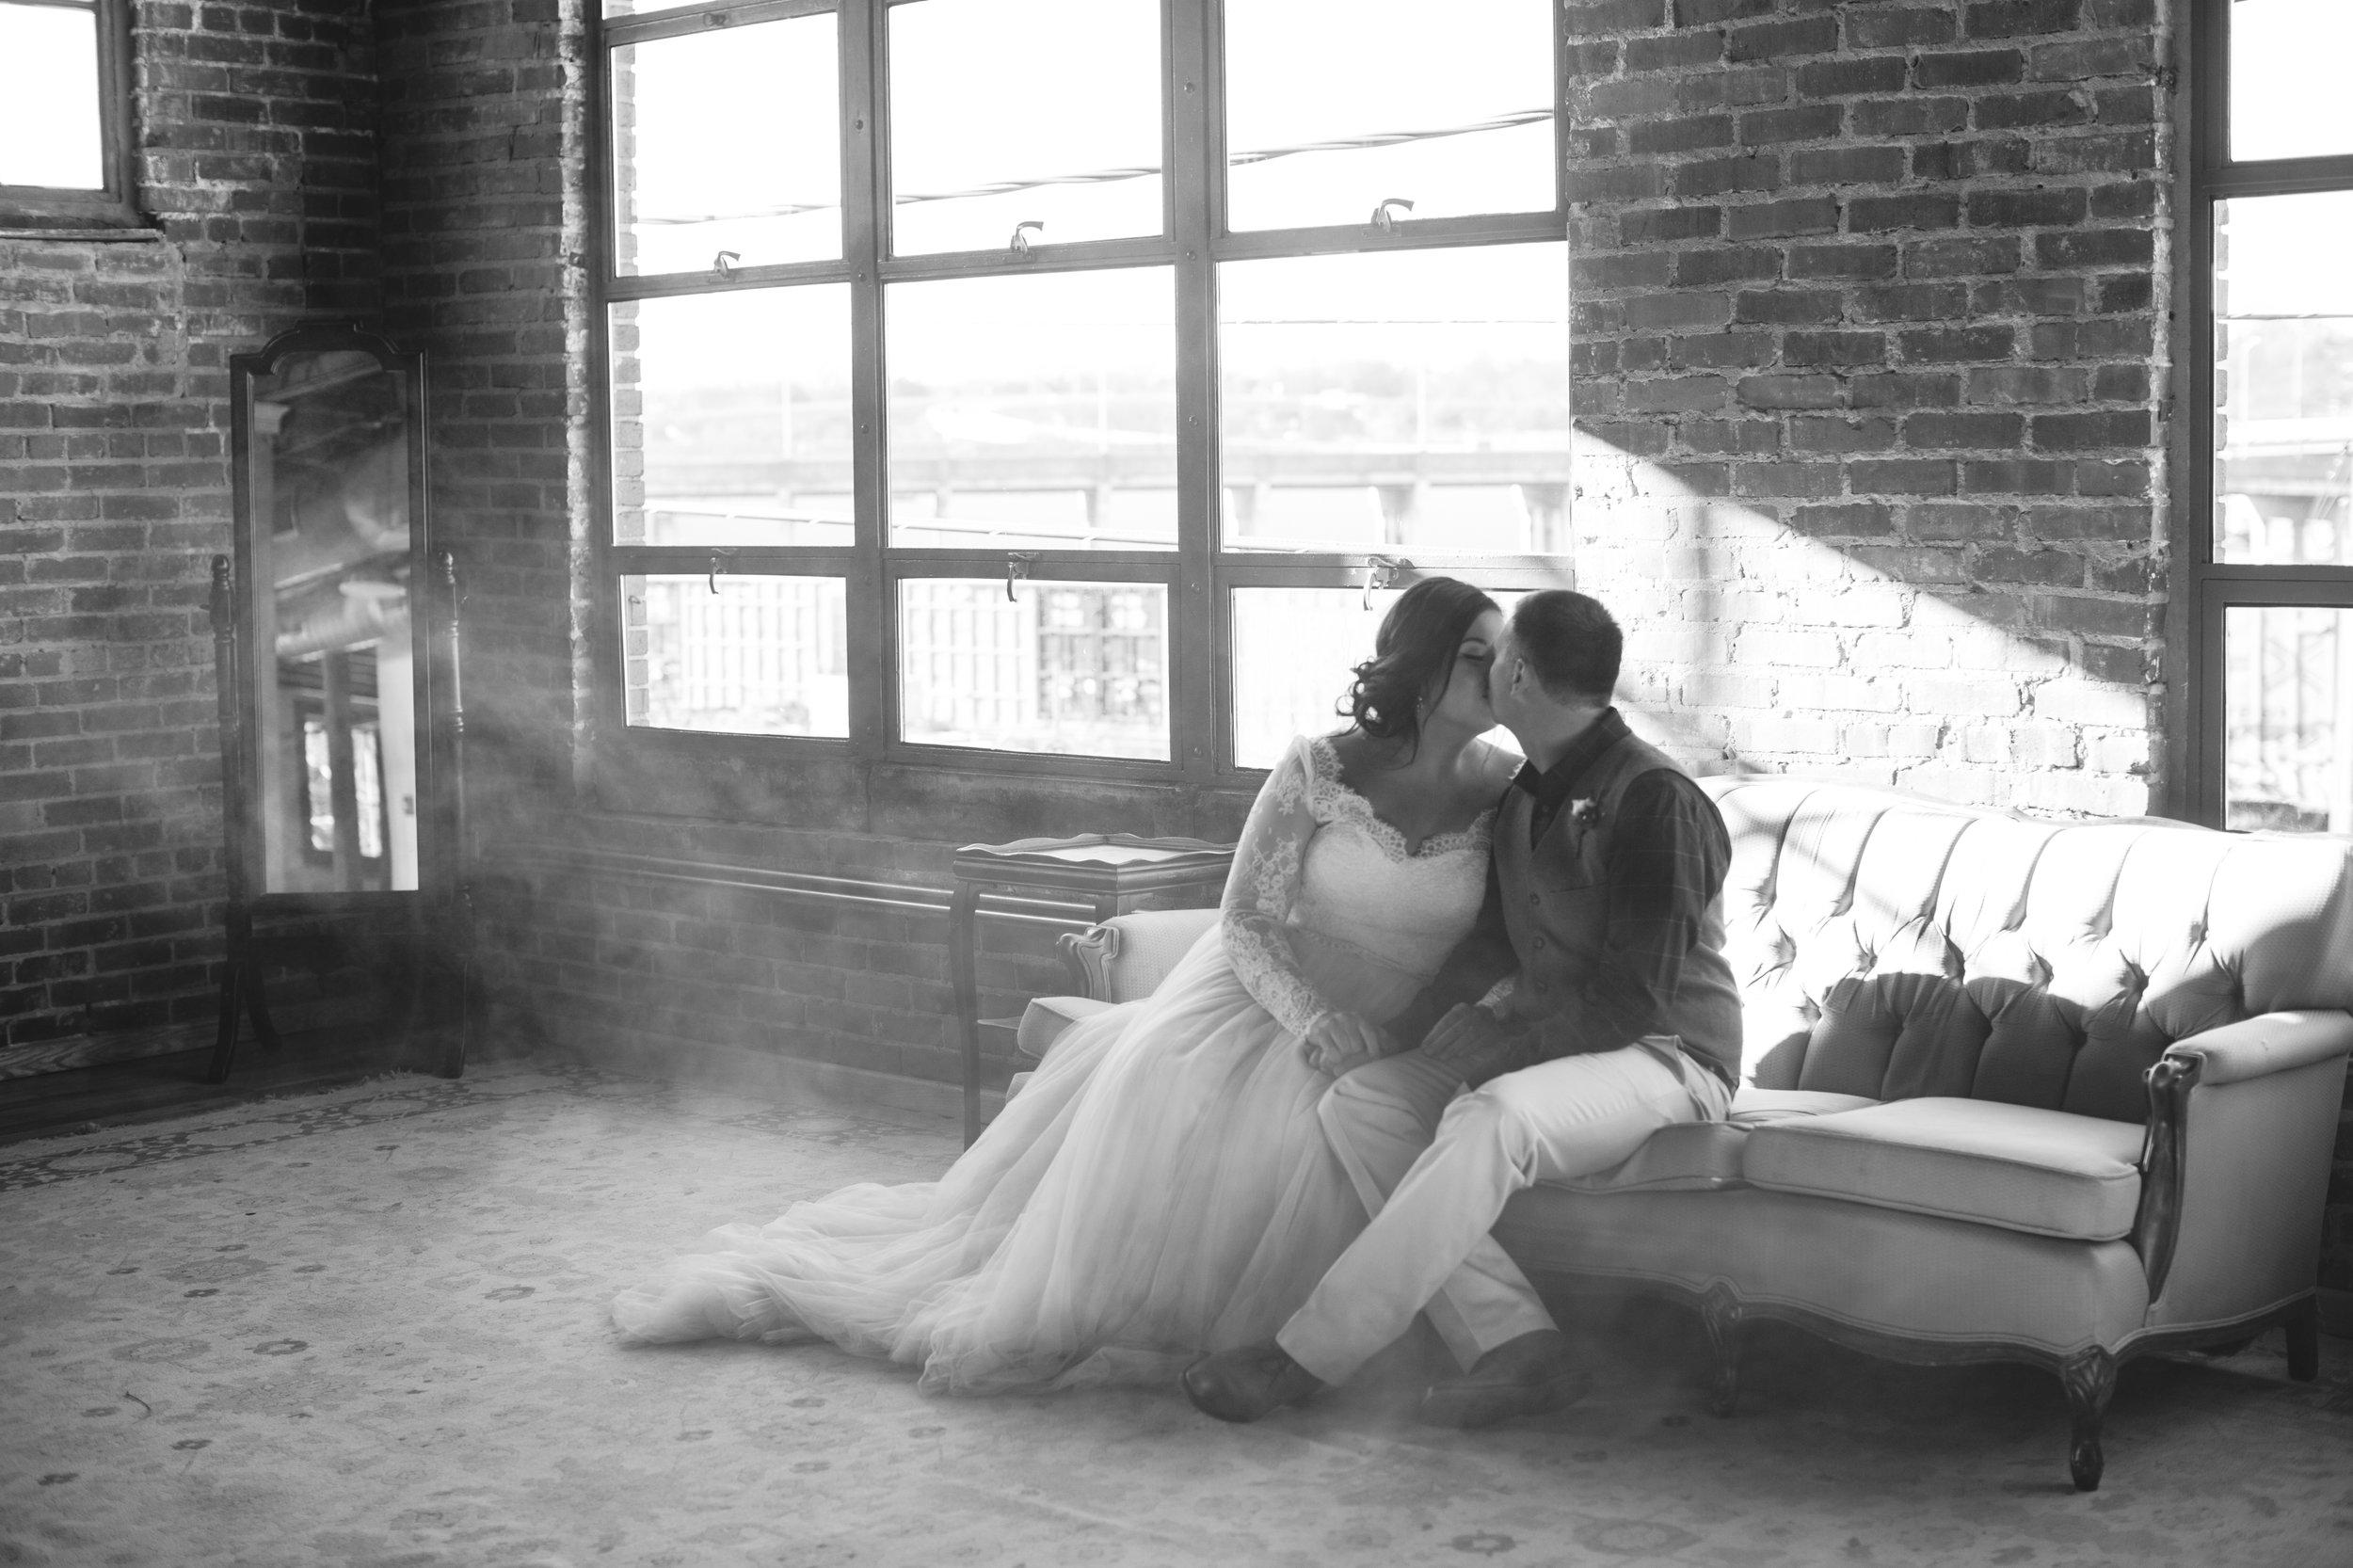 Lauren_Jeremy_Standard_Wedding_Knoxville_Abigail_Malone_Photography_FIlm-259.jpg